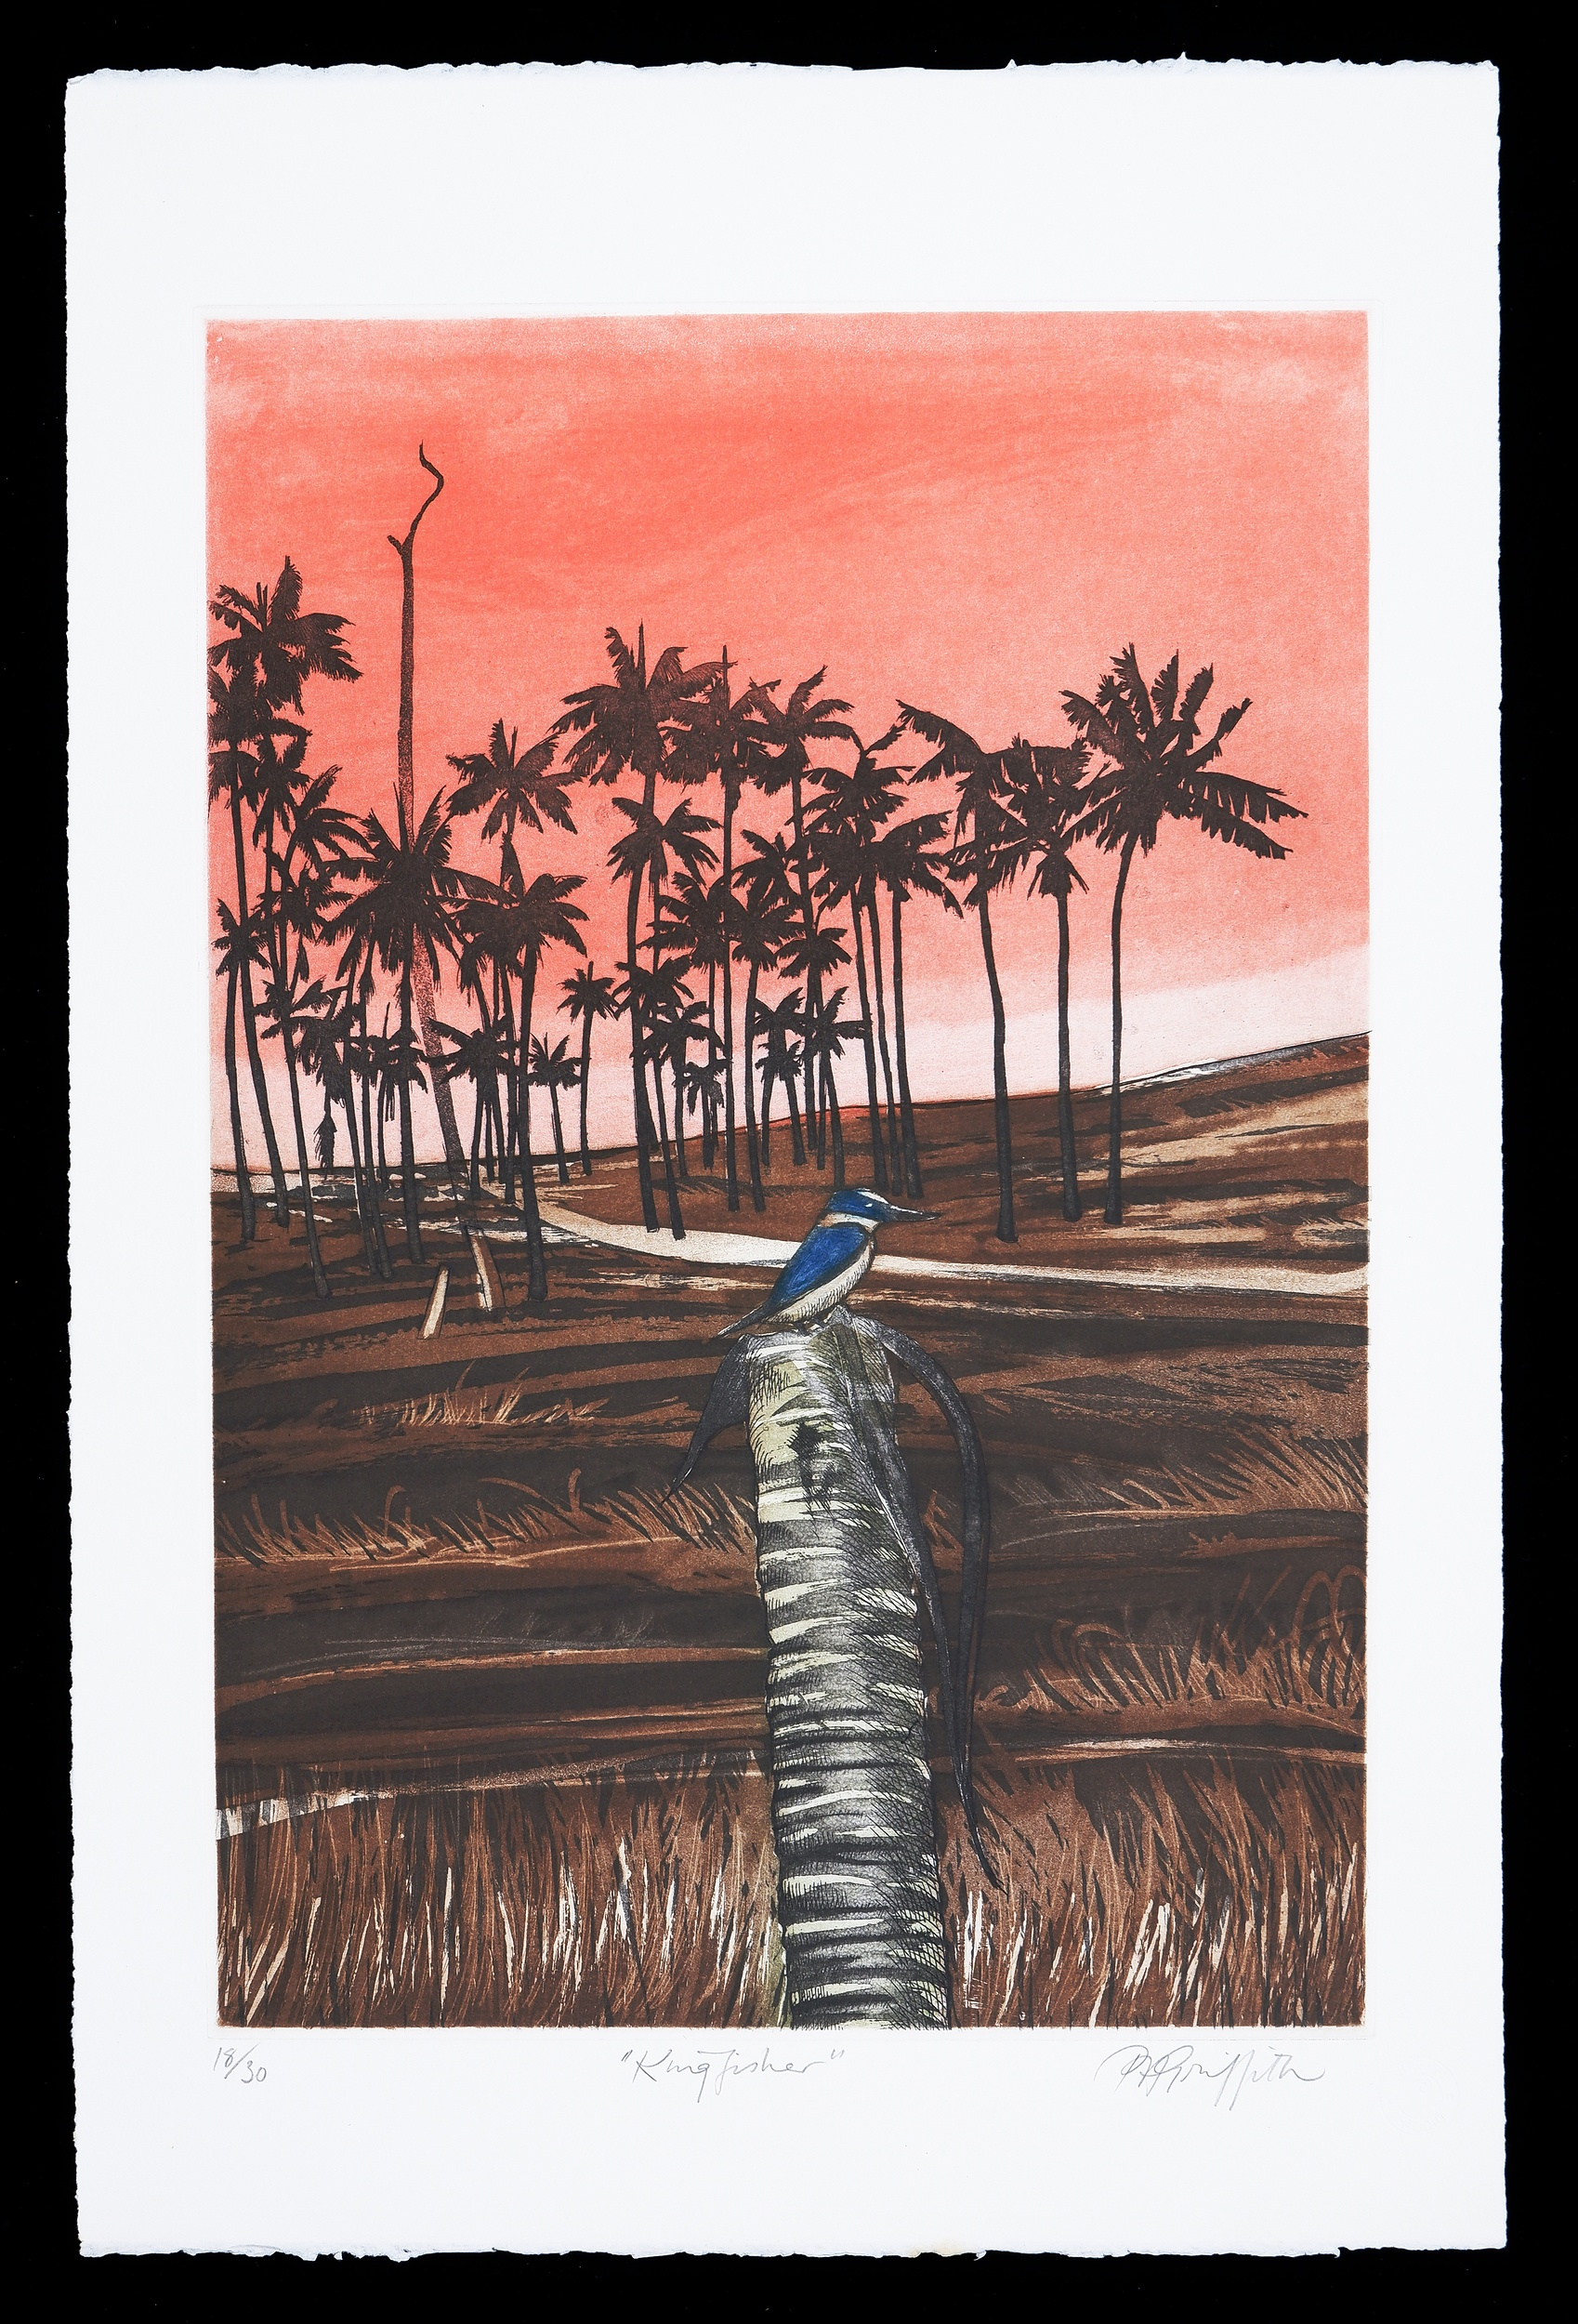 'Pamela Griffith (born 1943), Kingfisher, Coloured Etching Edition 18/30, 45 x 30 cm (image size)'